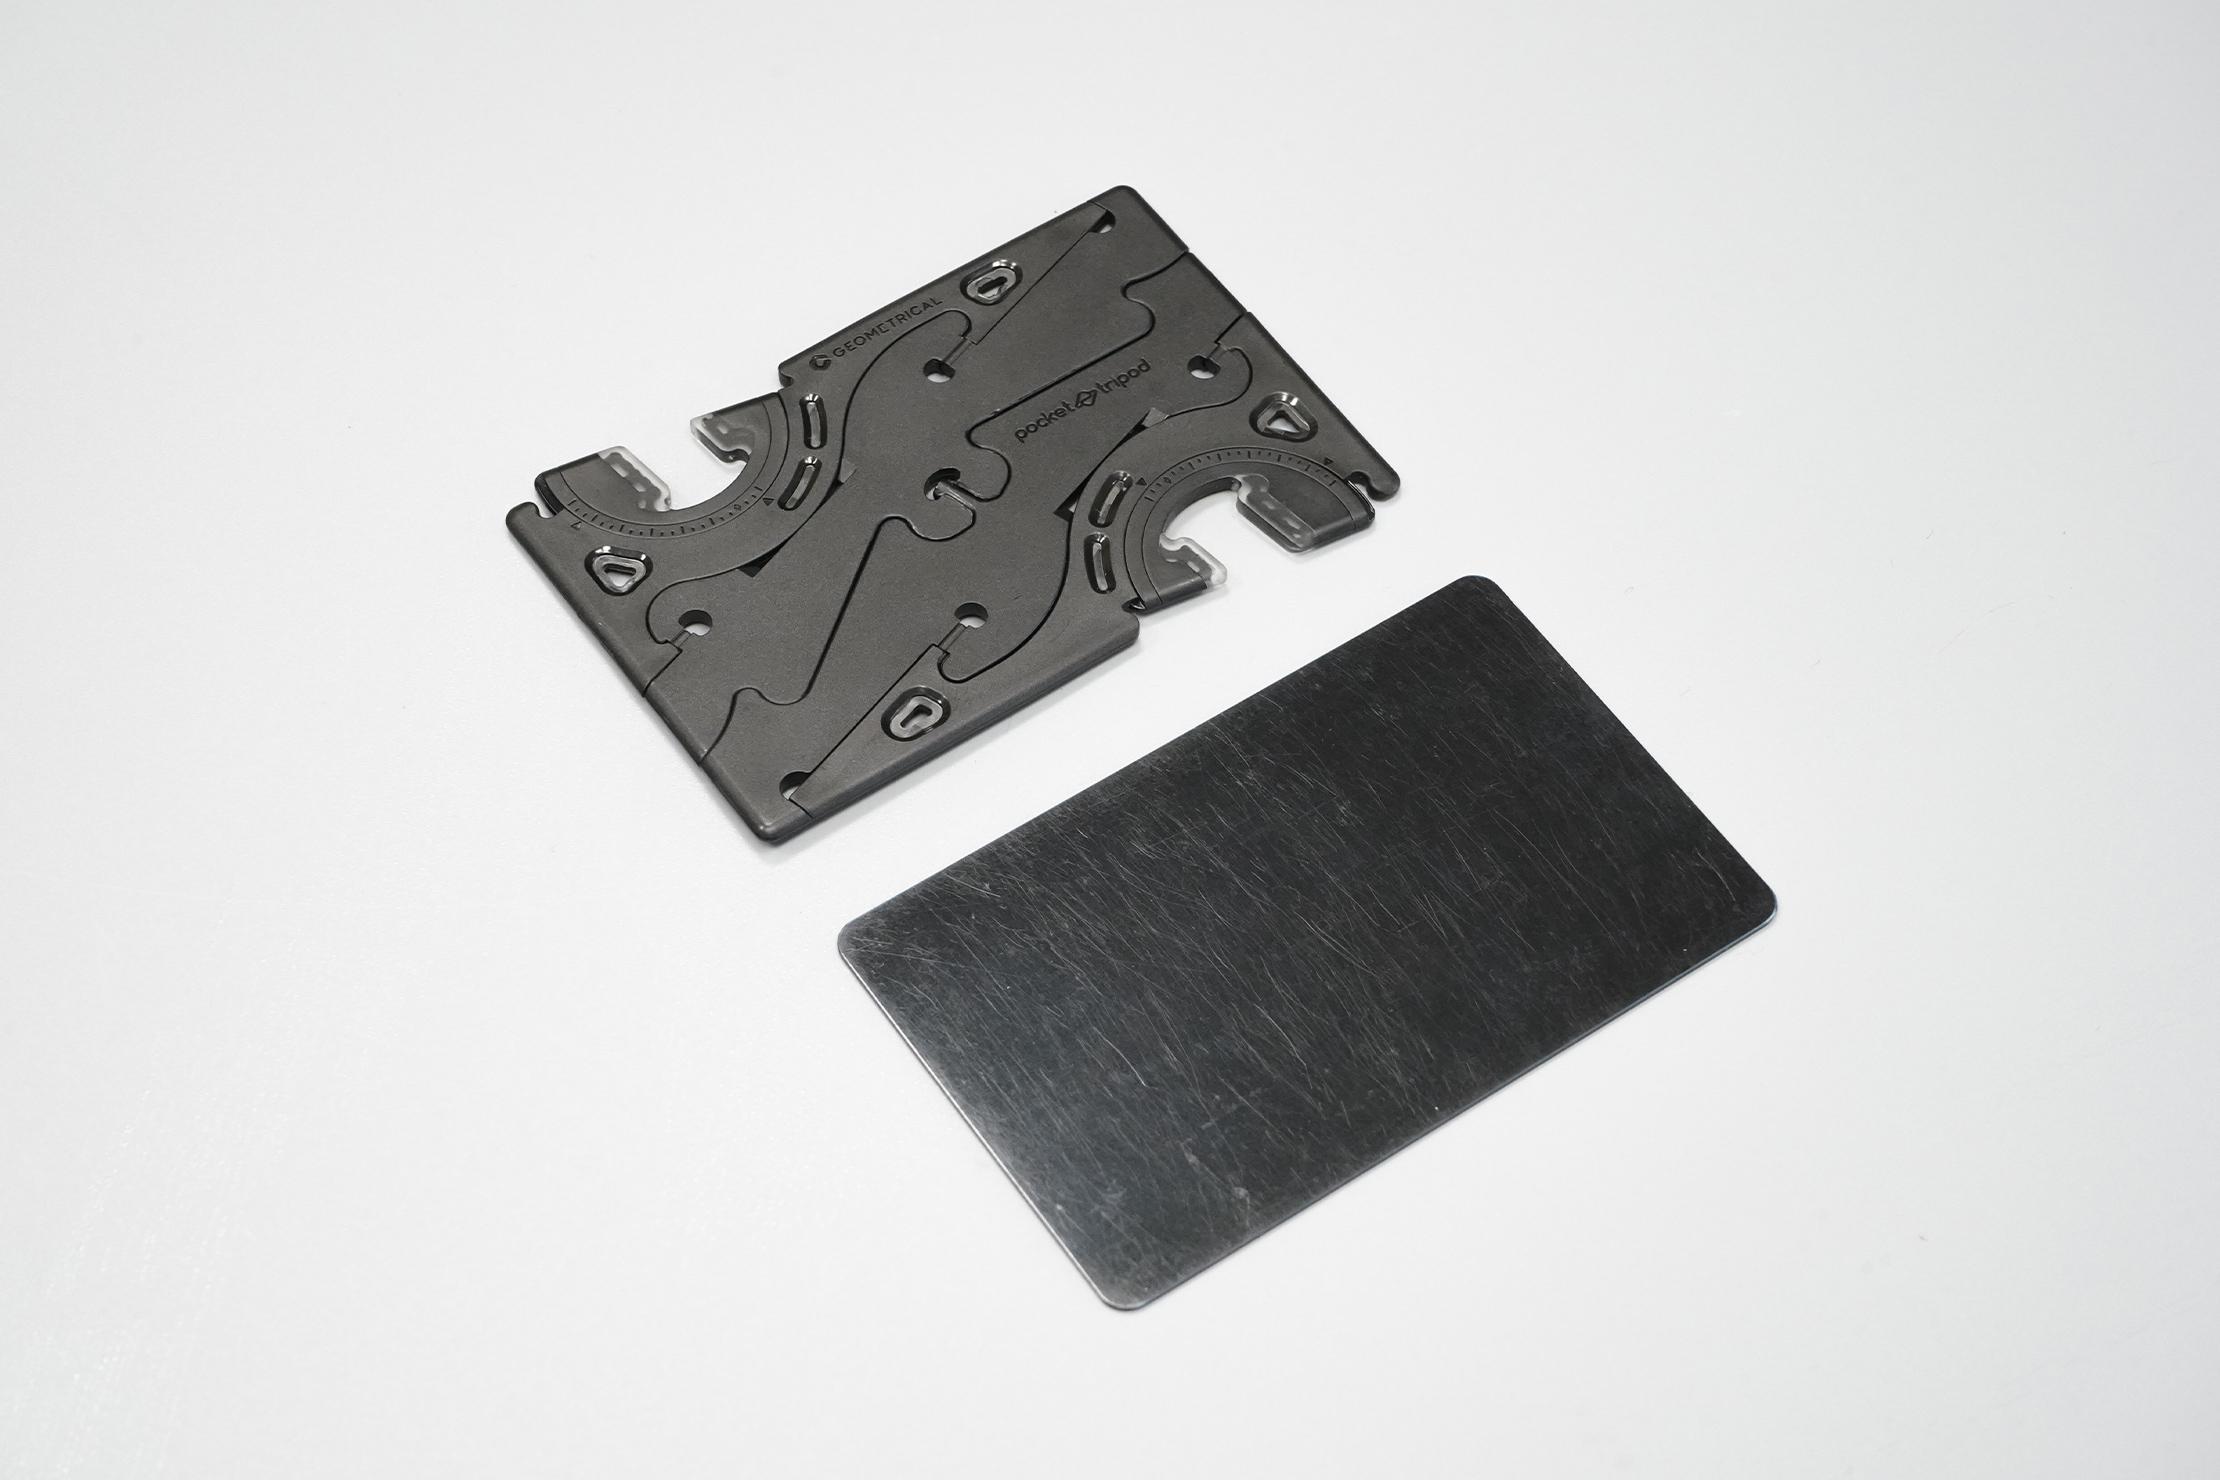 Geometrical Pocket Tripod Pro   The tripod in card form